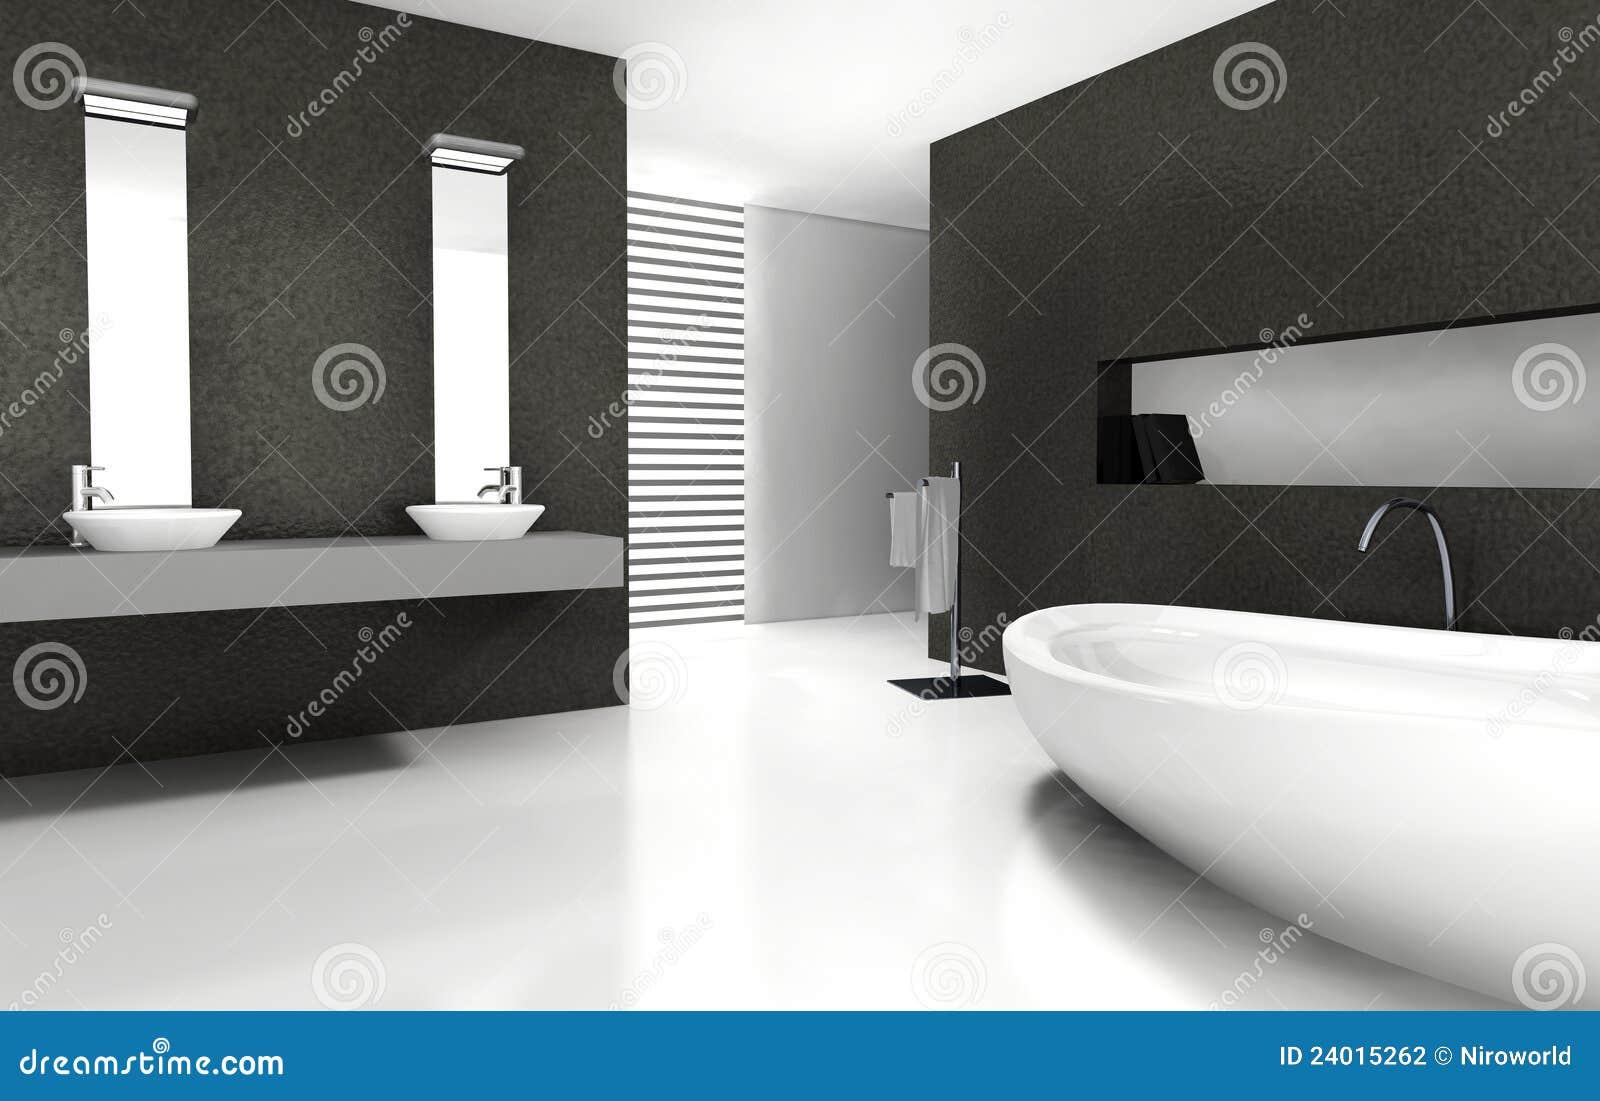 Bathroom Design stock illustration. Illustration of elegance - 24015262